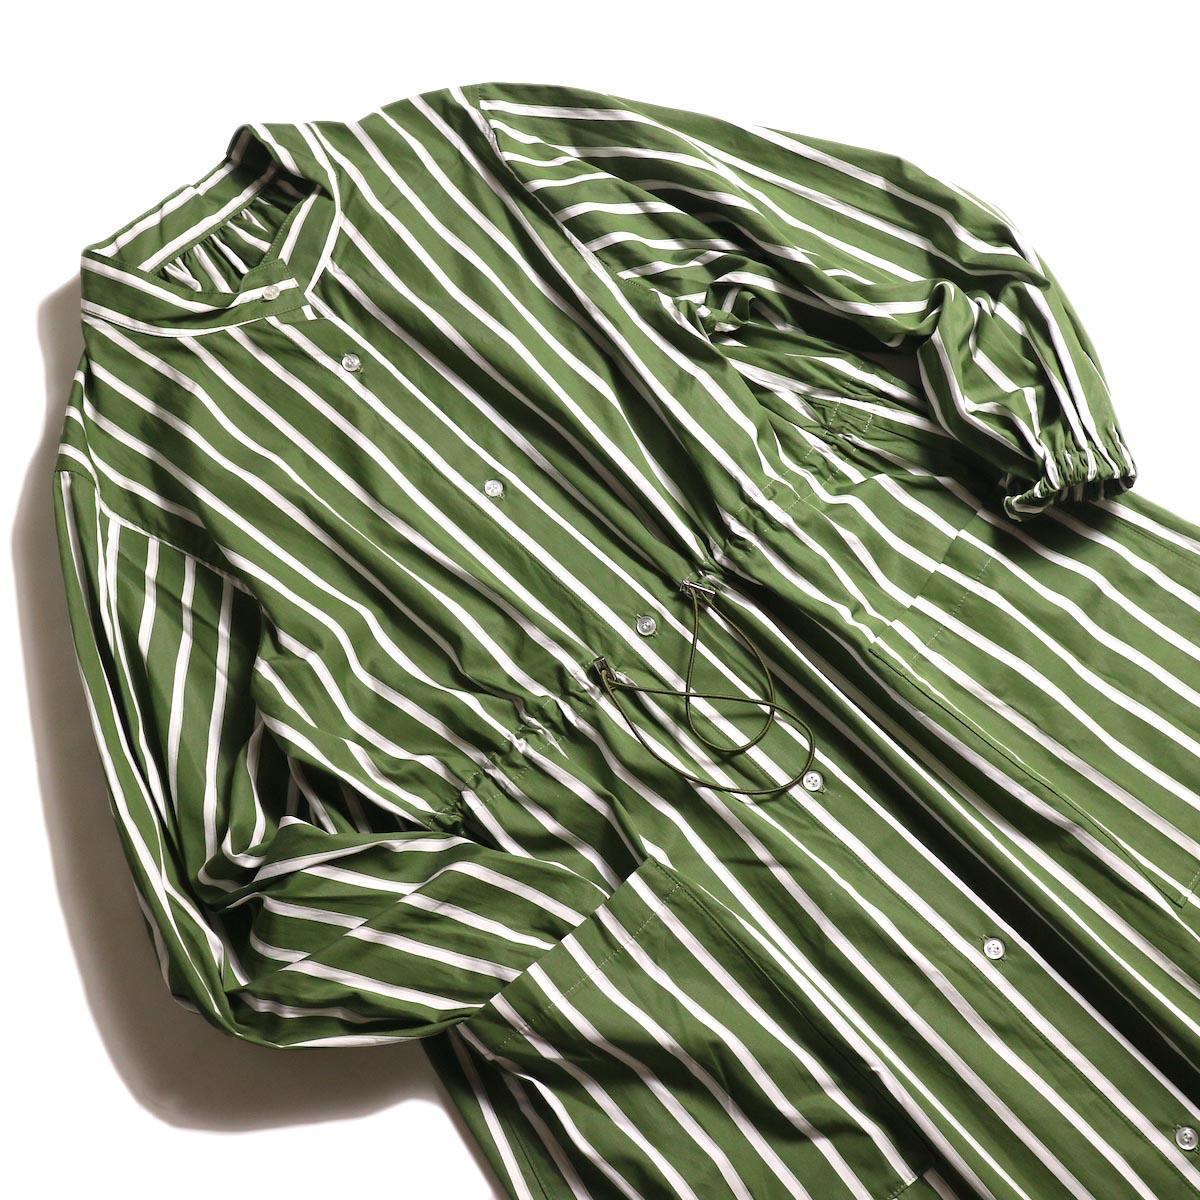 MY_ /  T/M DRAWSTRING SHIRT ONEPIECE (green stripe) 斜め